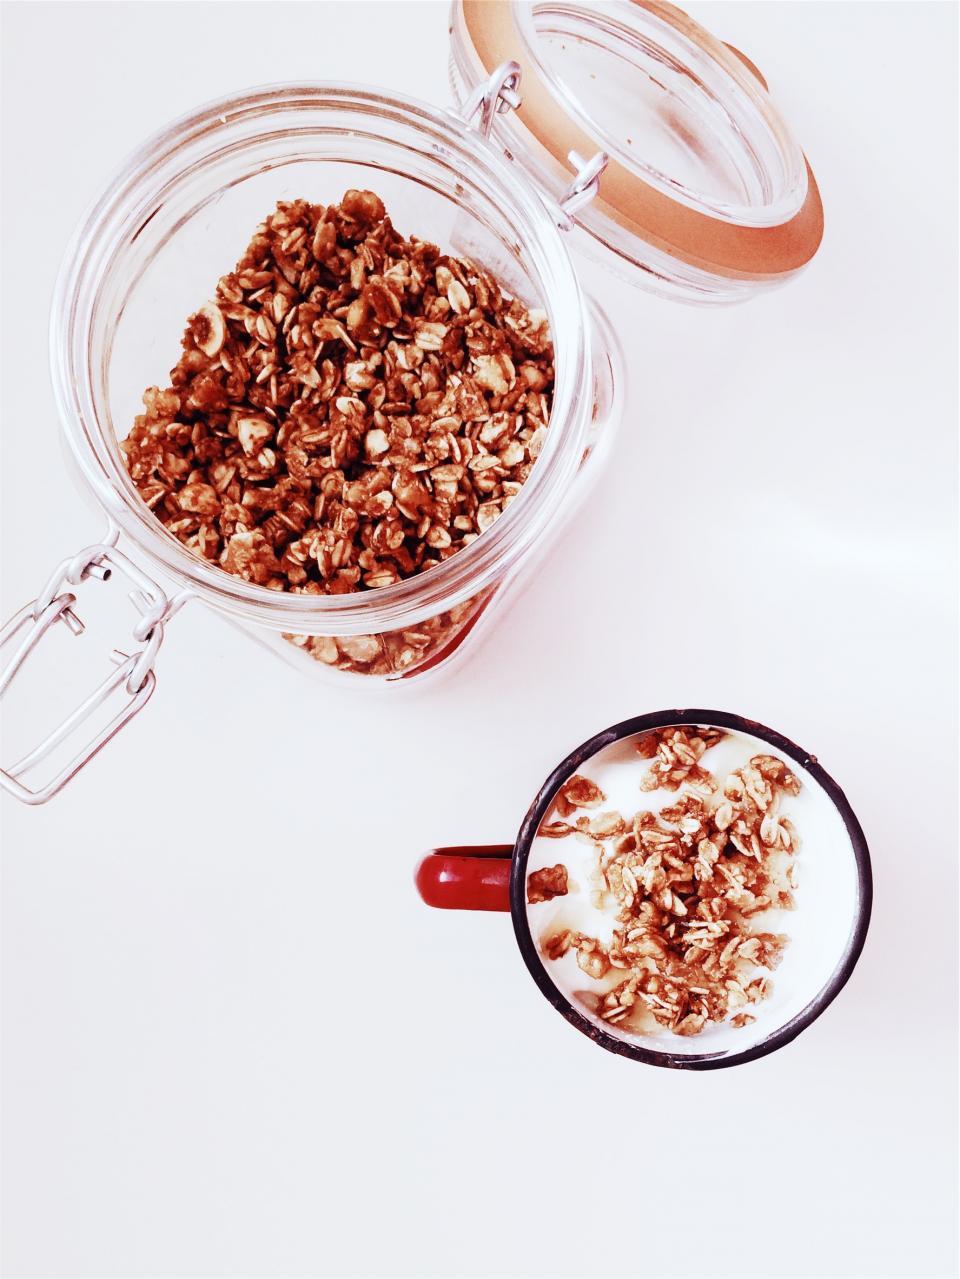 mug milk granola glassjar food cup cereal breakfast